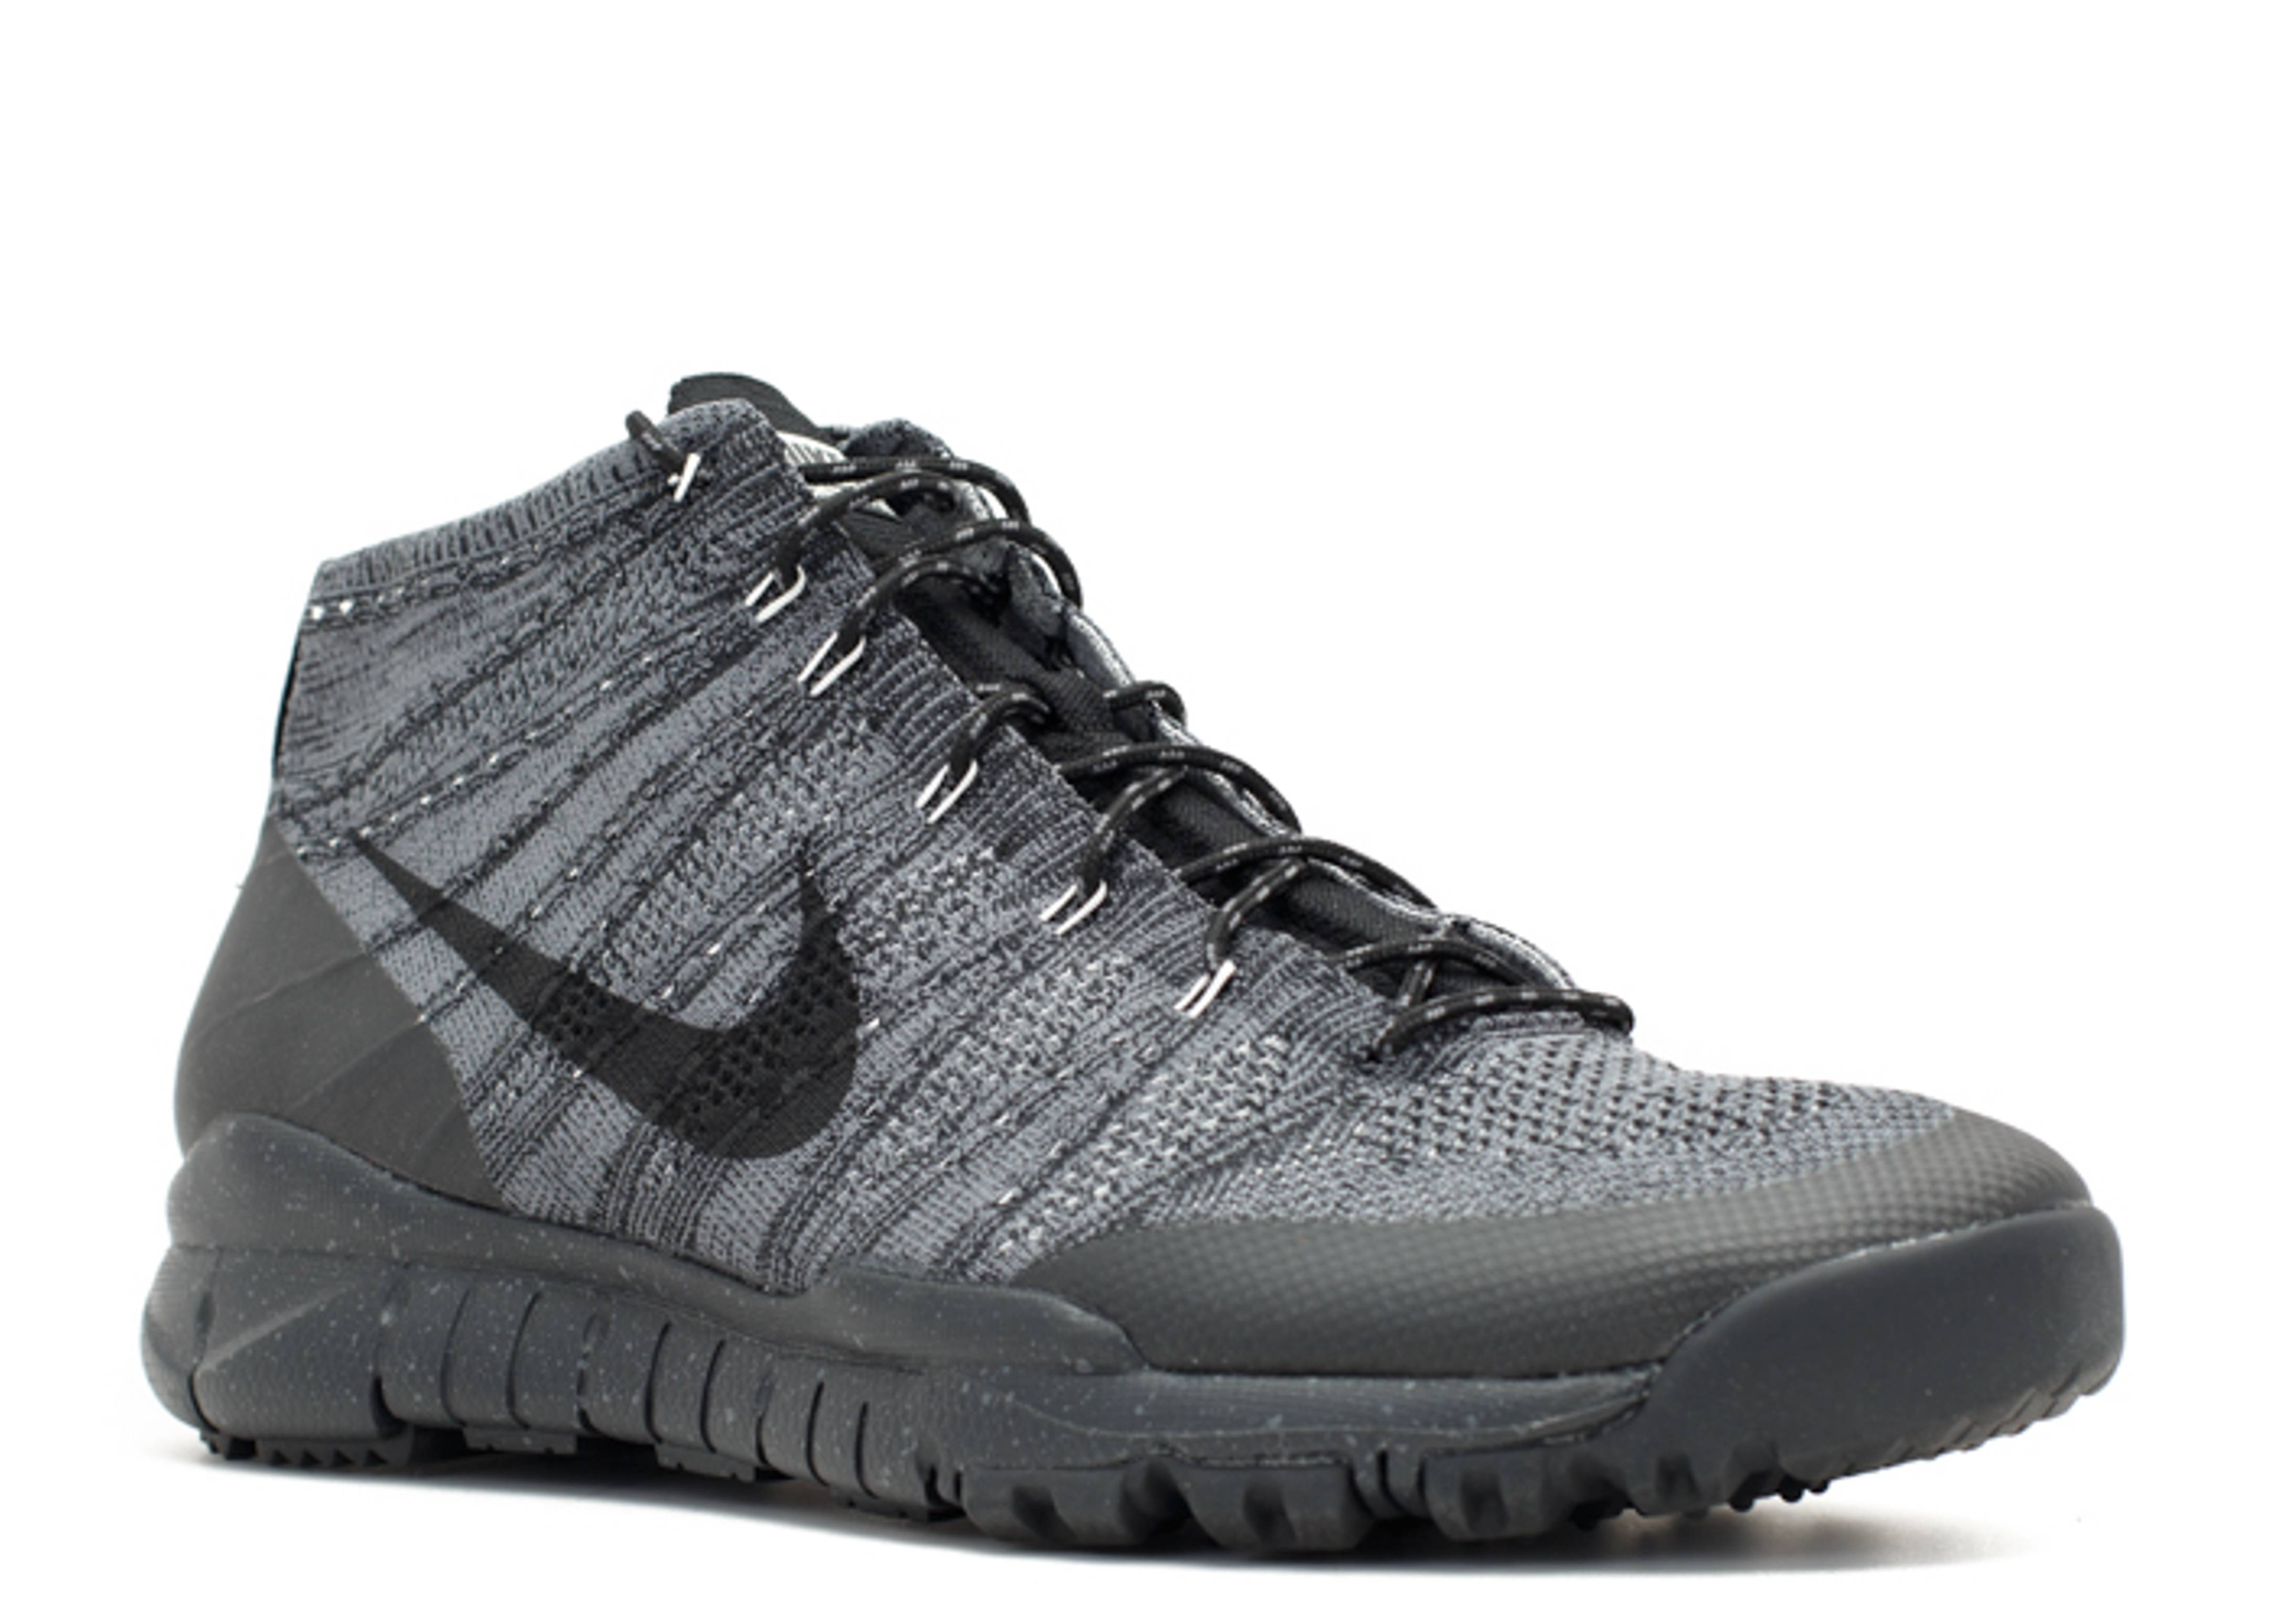 Nike Flyknit Trainer Chukka FSB Black Dark Grey Sneakers (Black/Black-Dark Grey-Sail)